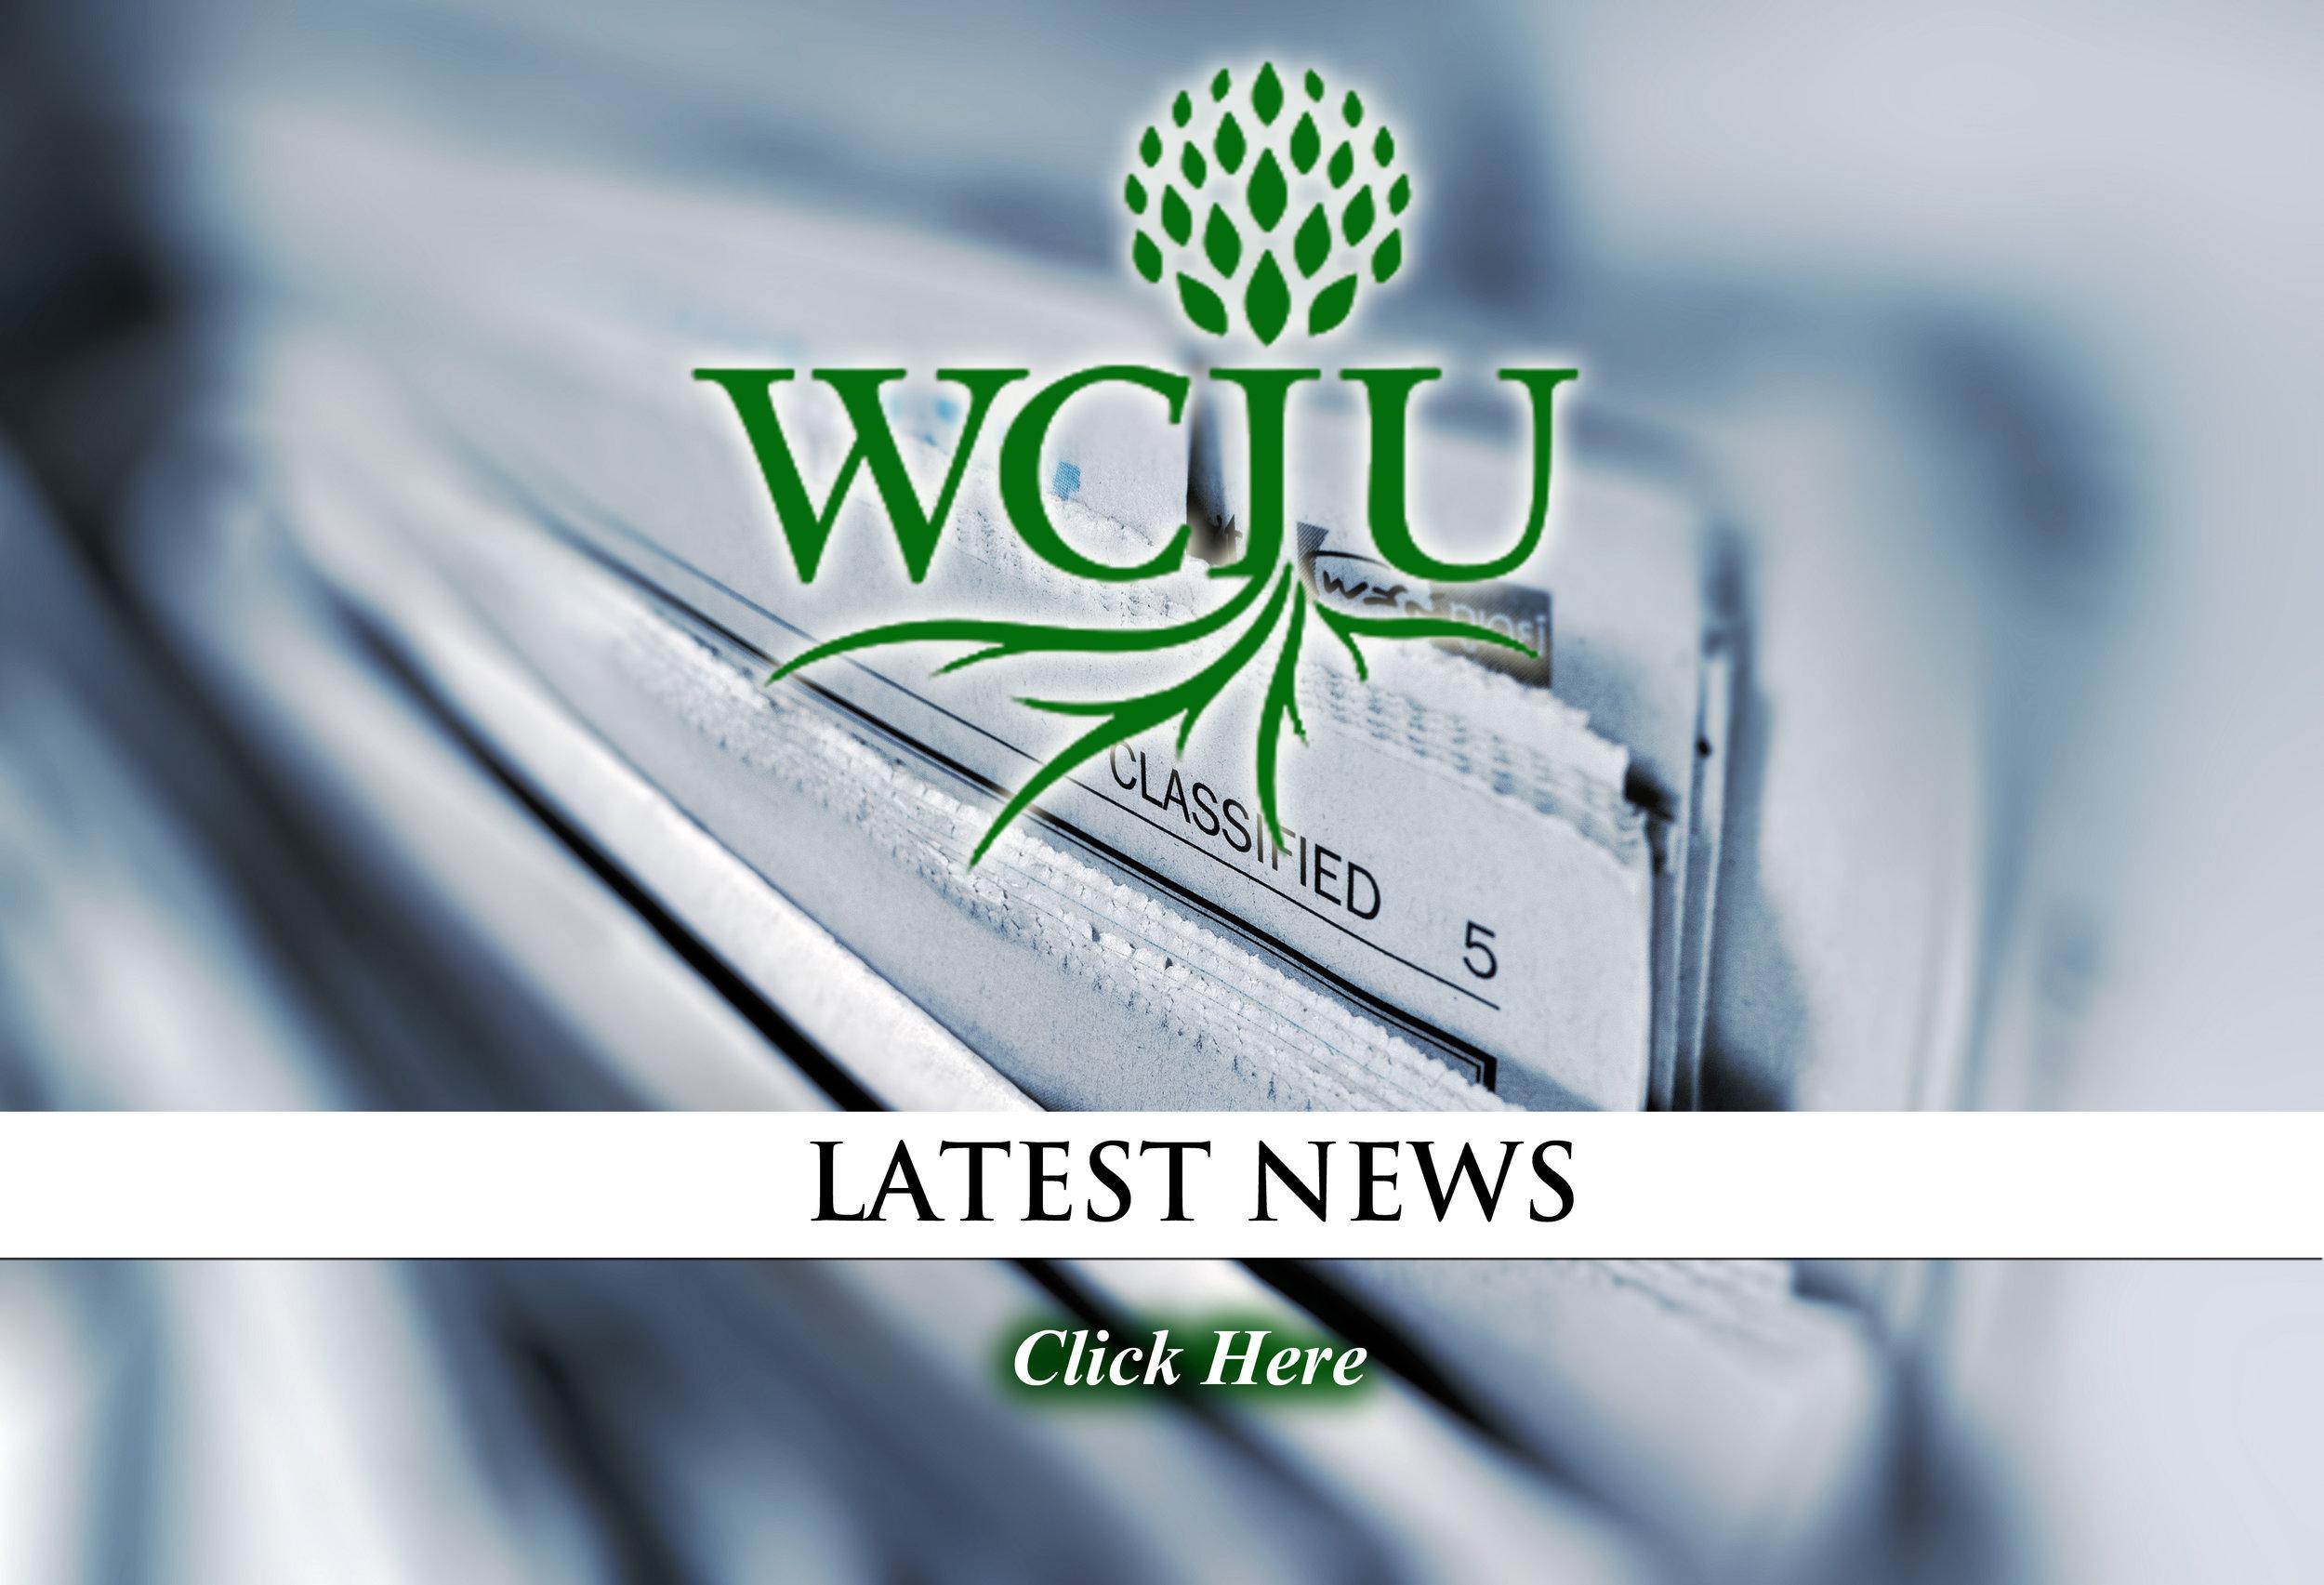 WCIU latest news click here.jpg